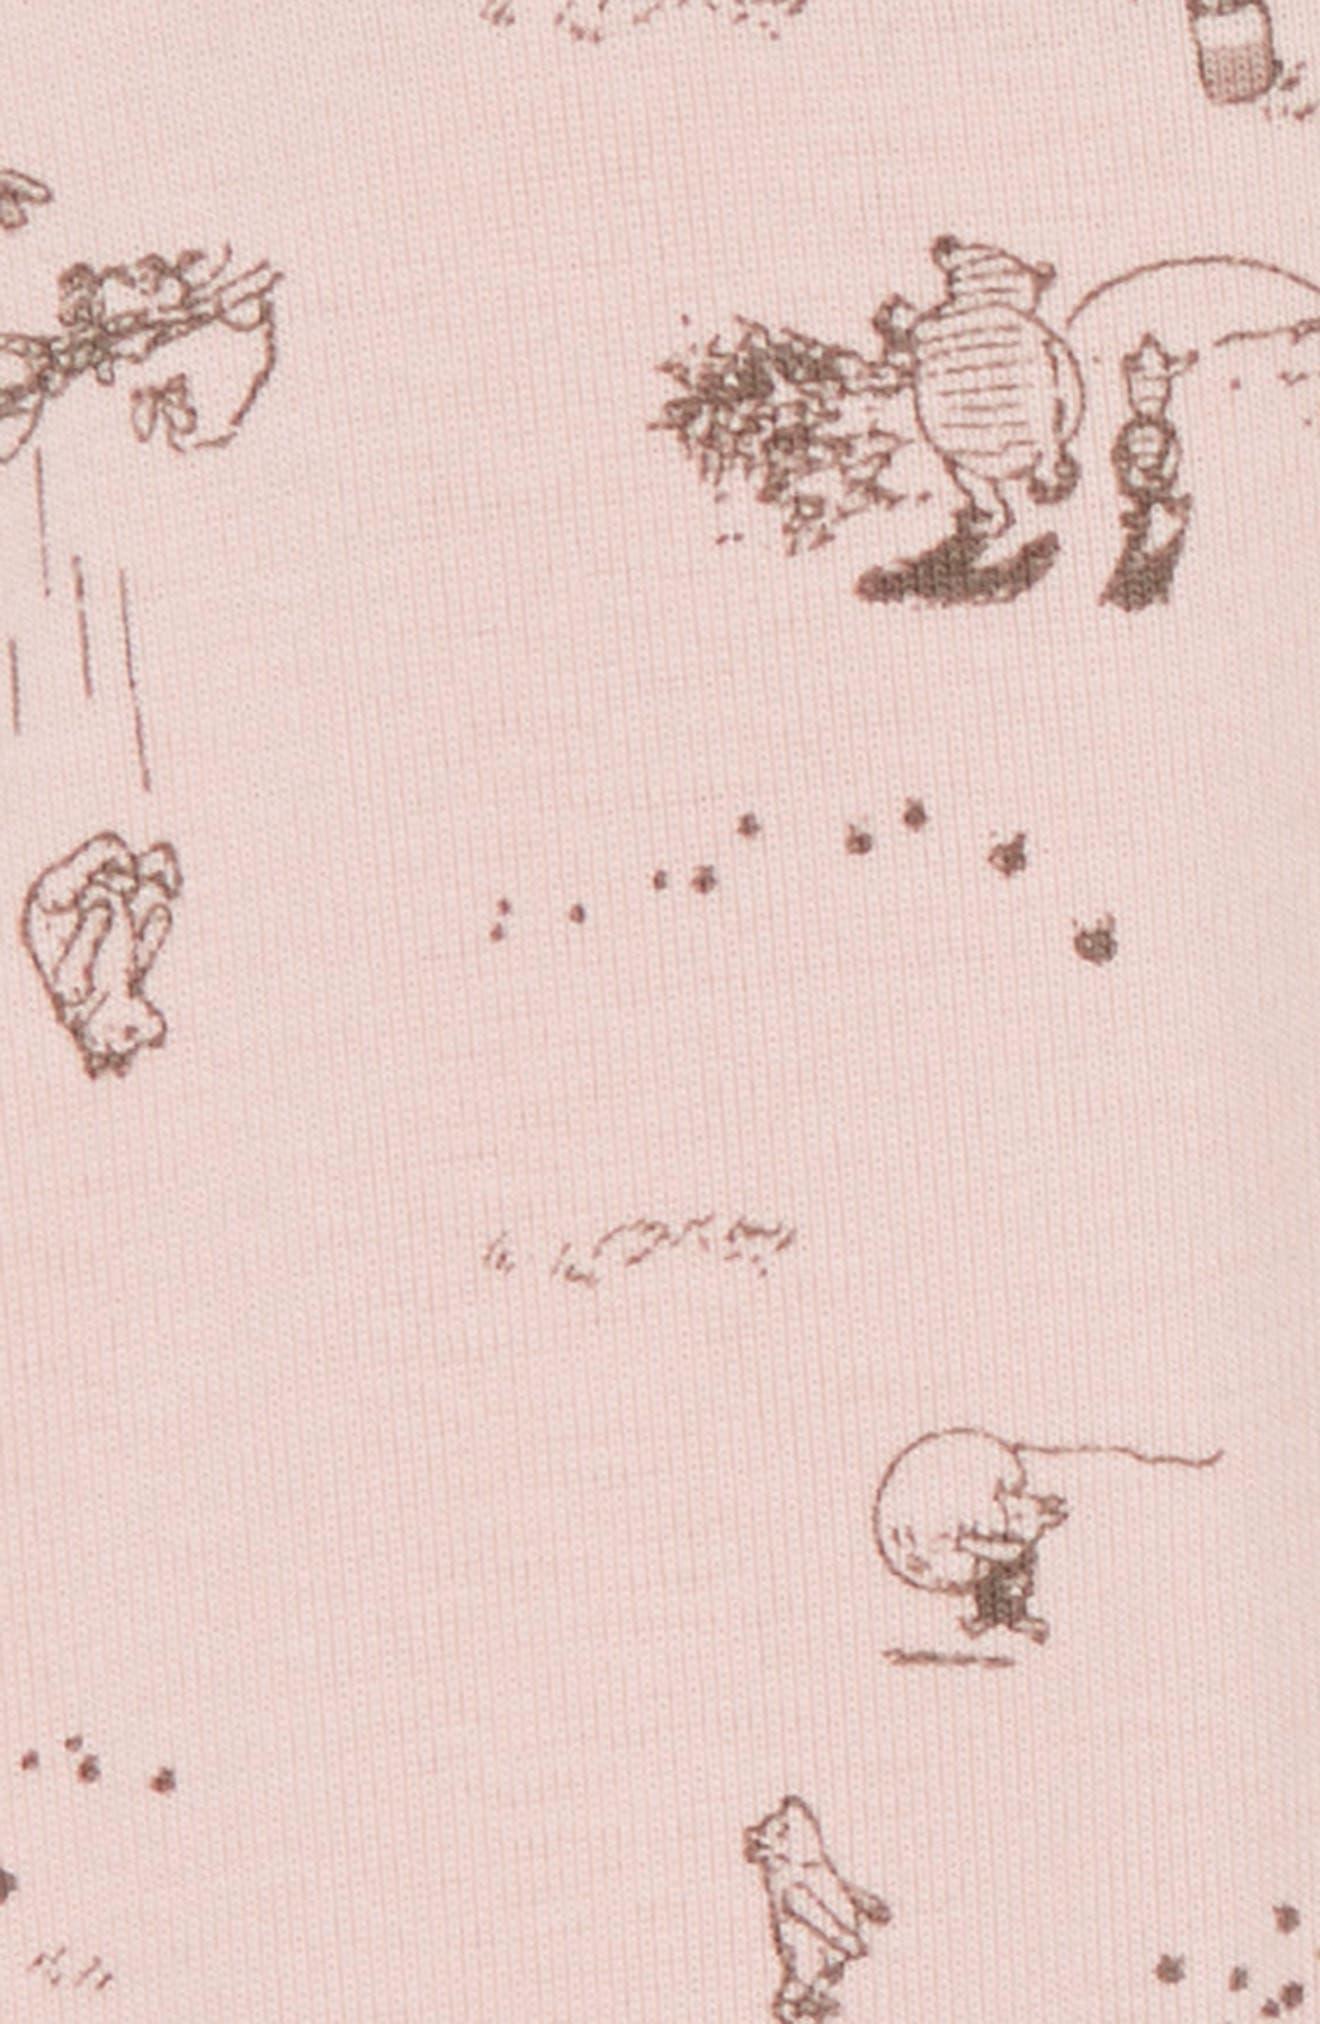 x Disney<sup>®</sup> Winnie the Pooh Organic Cotton Leggings,                             Alternate thumbnail 2, color,                             Powder